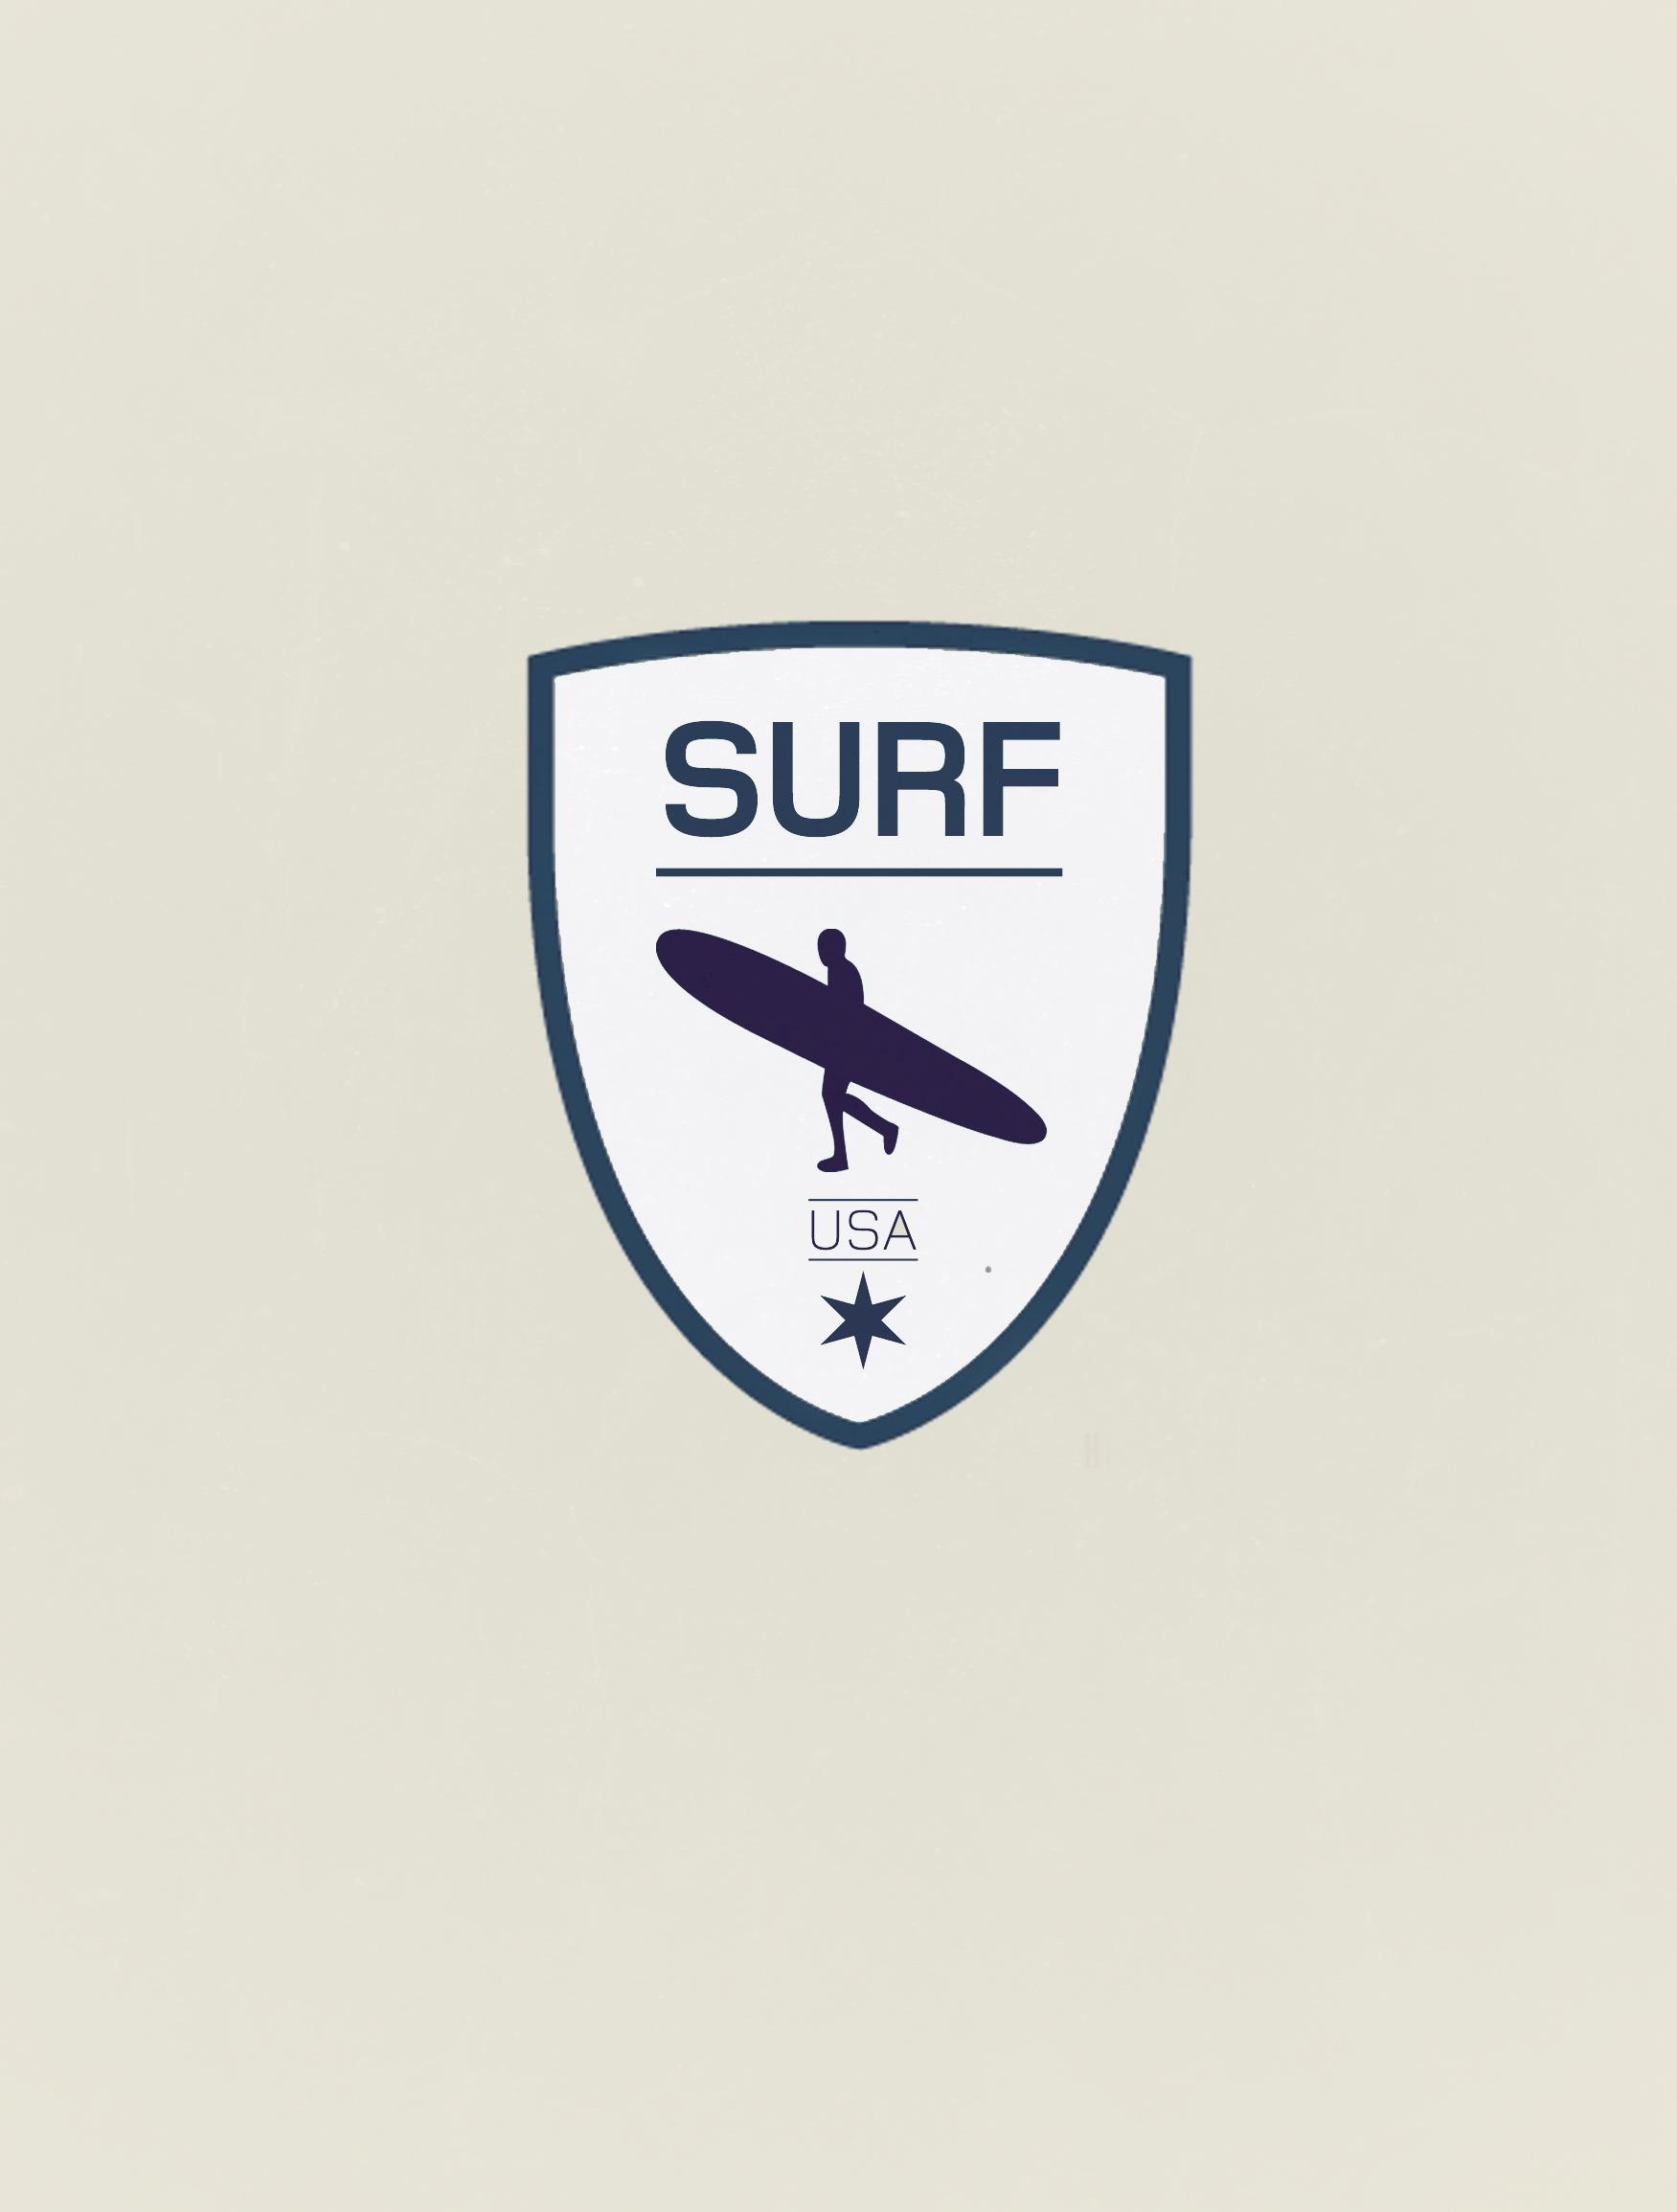 Surfer Logo   www.imgkid.com - The Image Kid Has It!